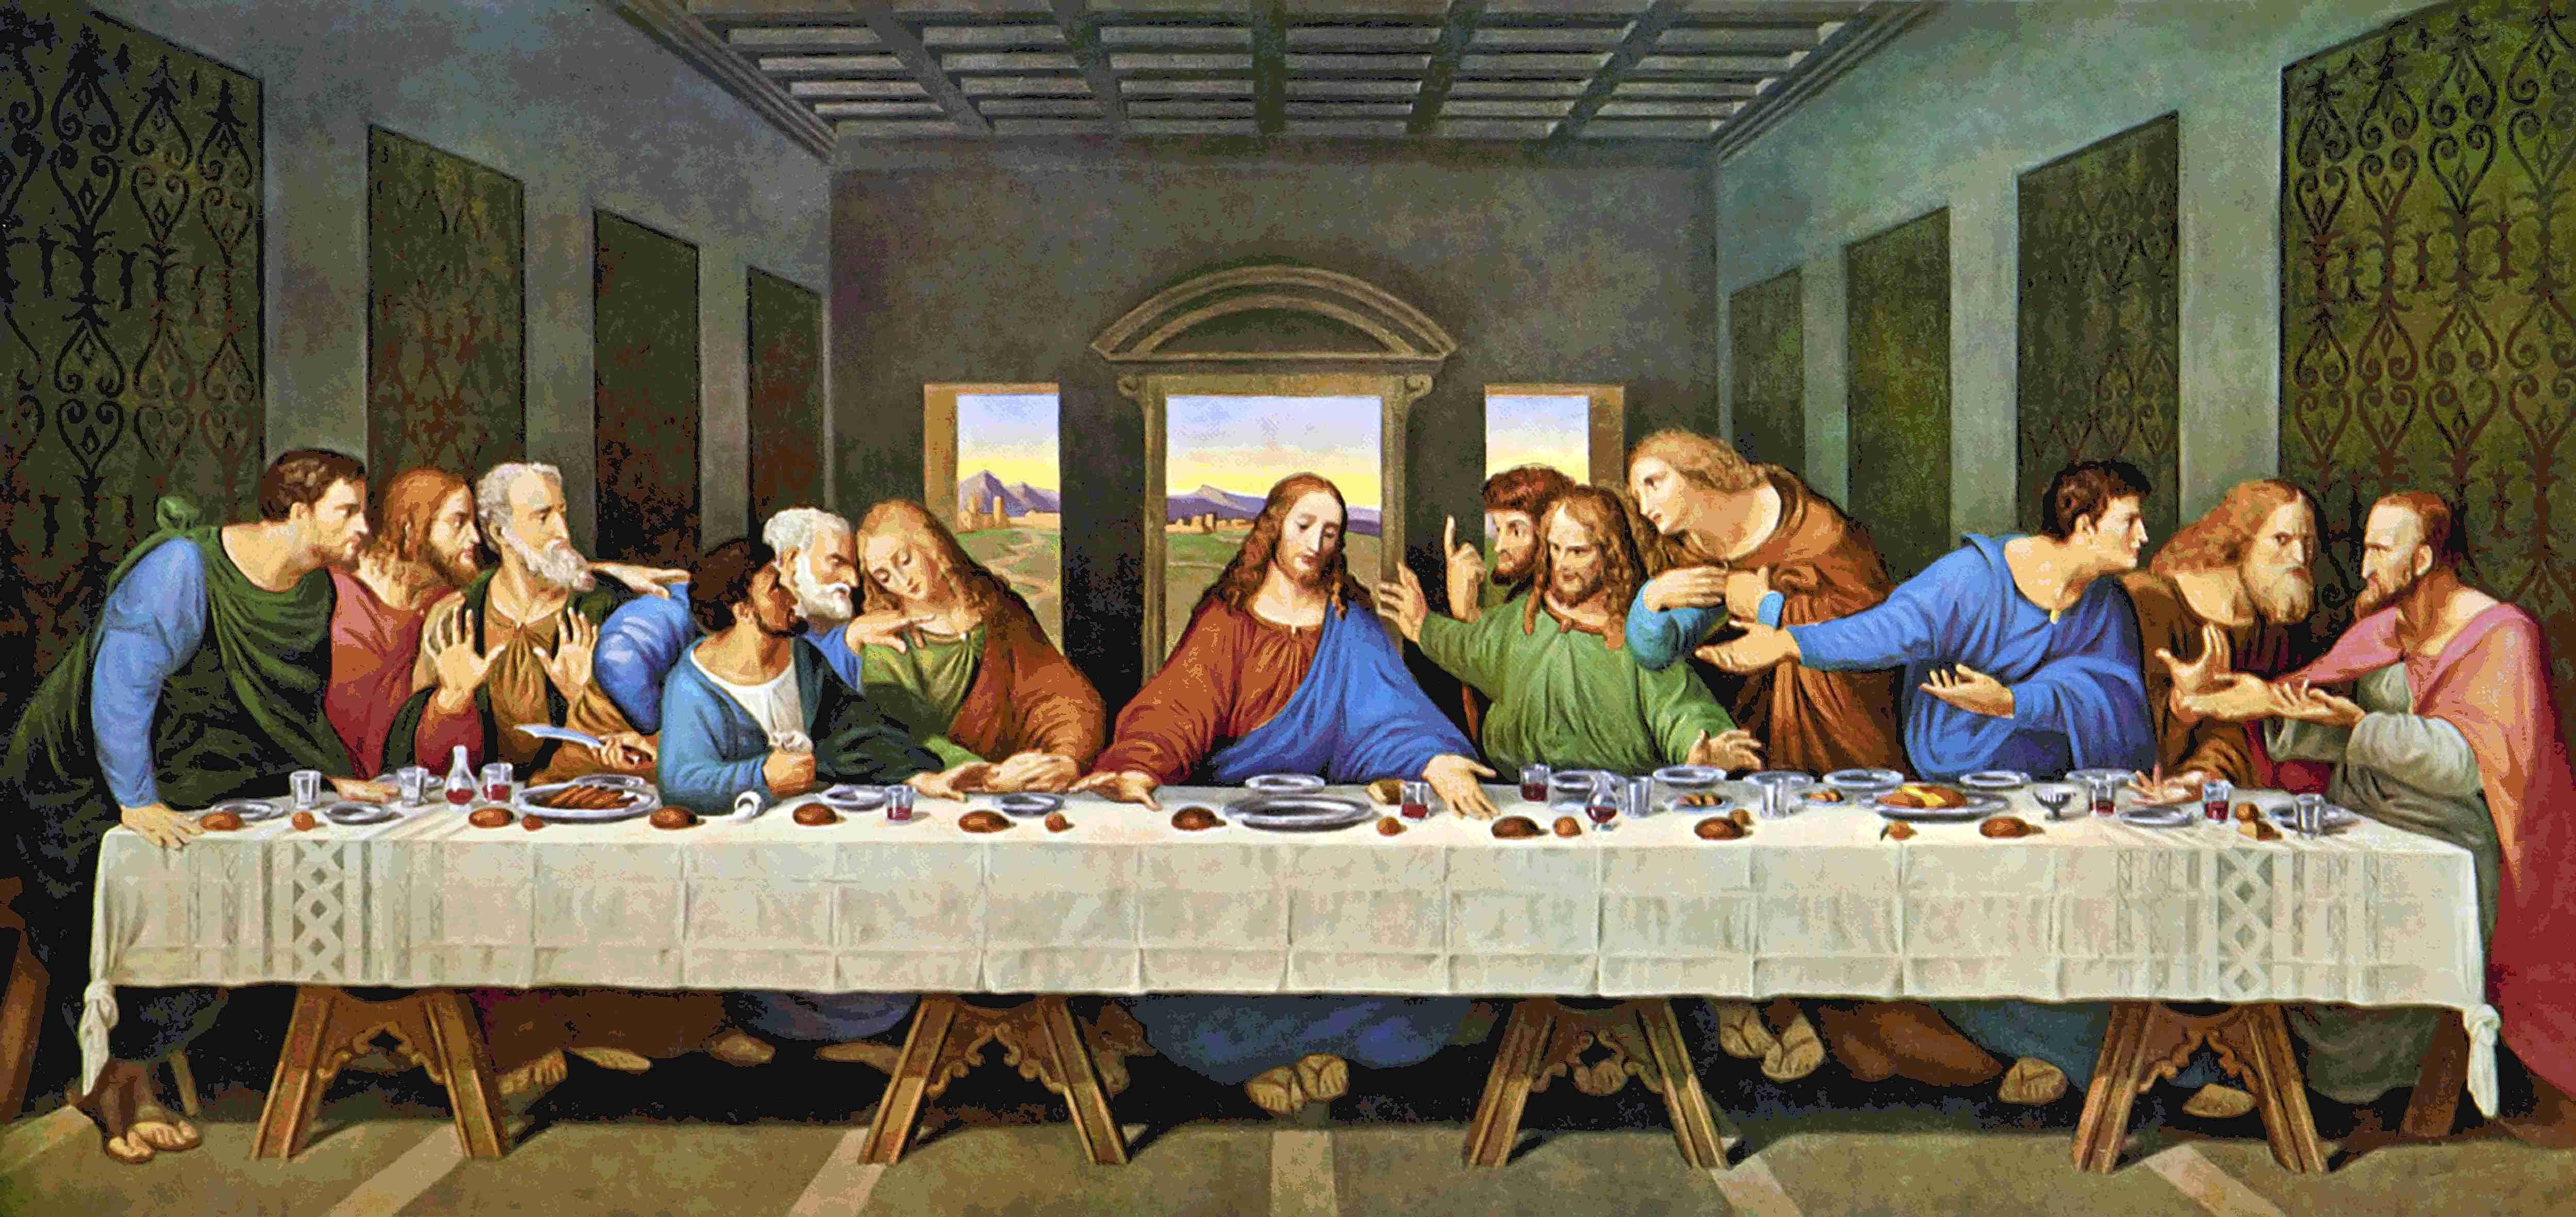 Pin By Amina Monahan On Arte Renacimiento Last Supper Da Vinci Painting Da Vinci Art